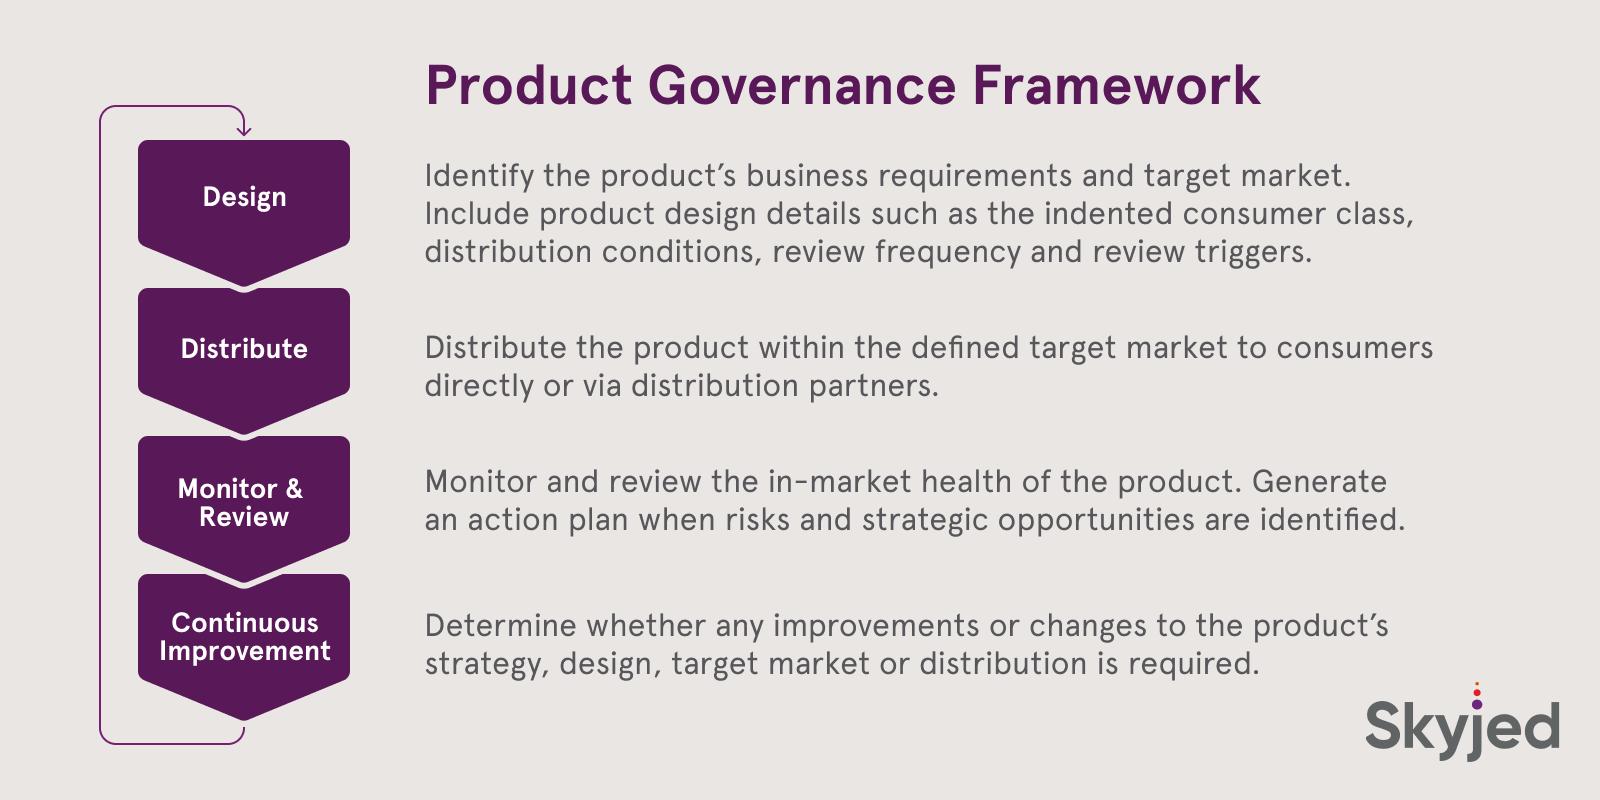 Product Governance Framework